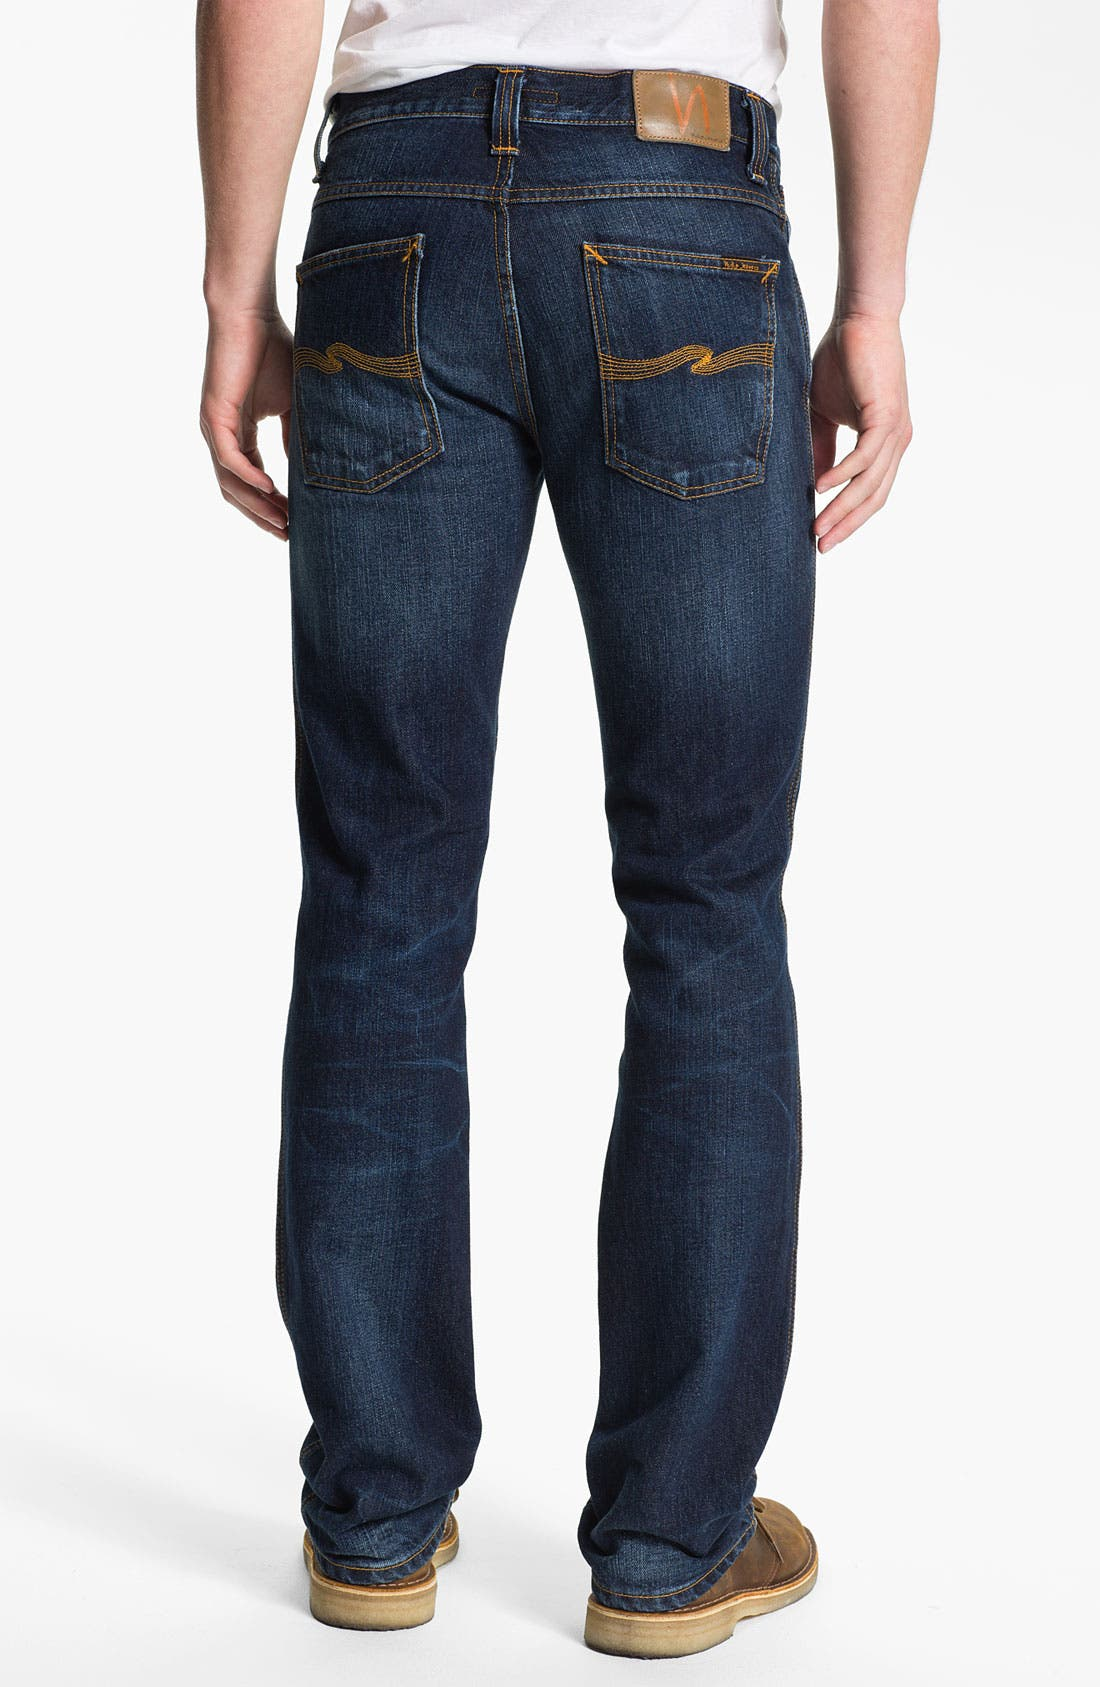 Main Image - Nudie 'Slim Jim' Slim Straight Leg Jeans (Organic Blue Note)